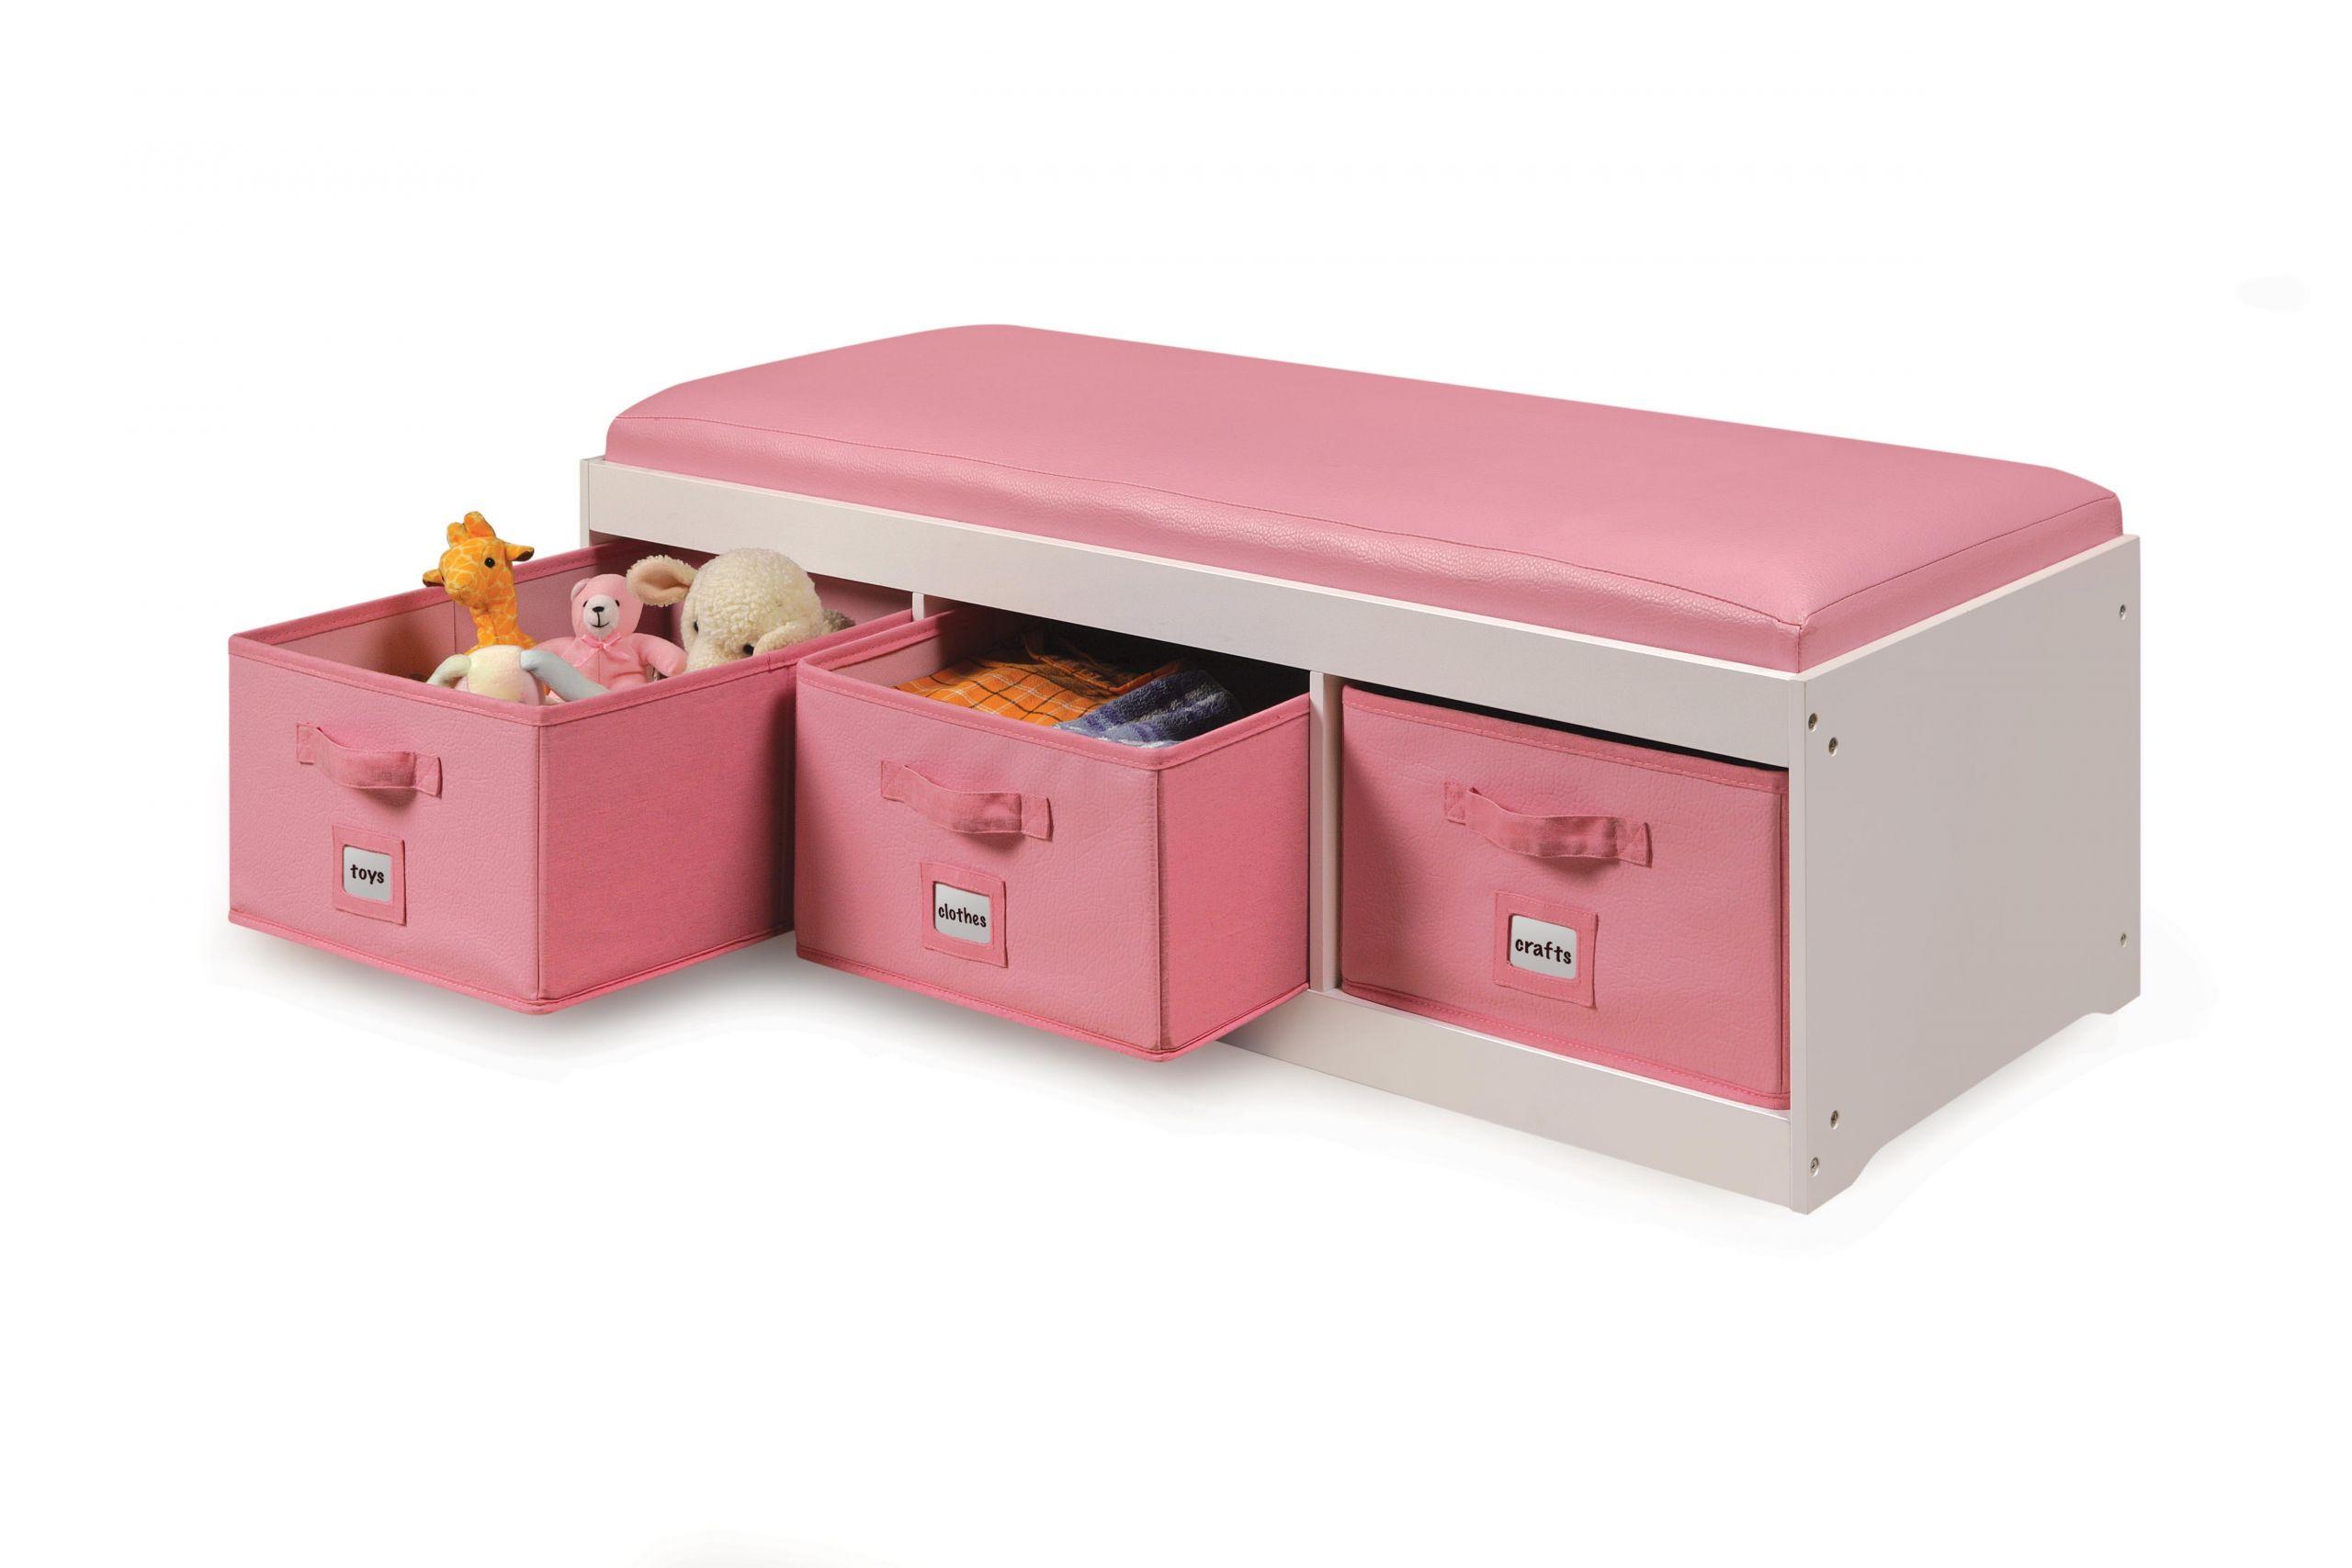 Storage Bench Kids Best Of Amazon Kid S Cushioned Storage Bench with 3 Basket